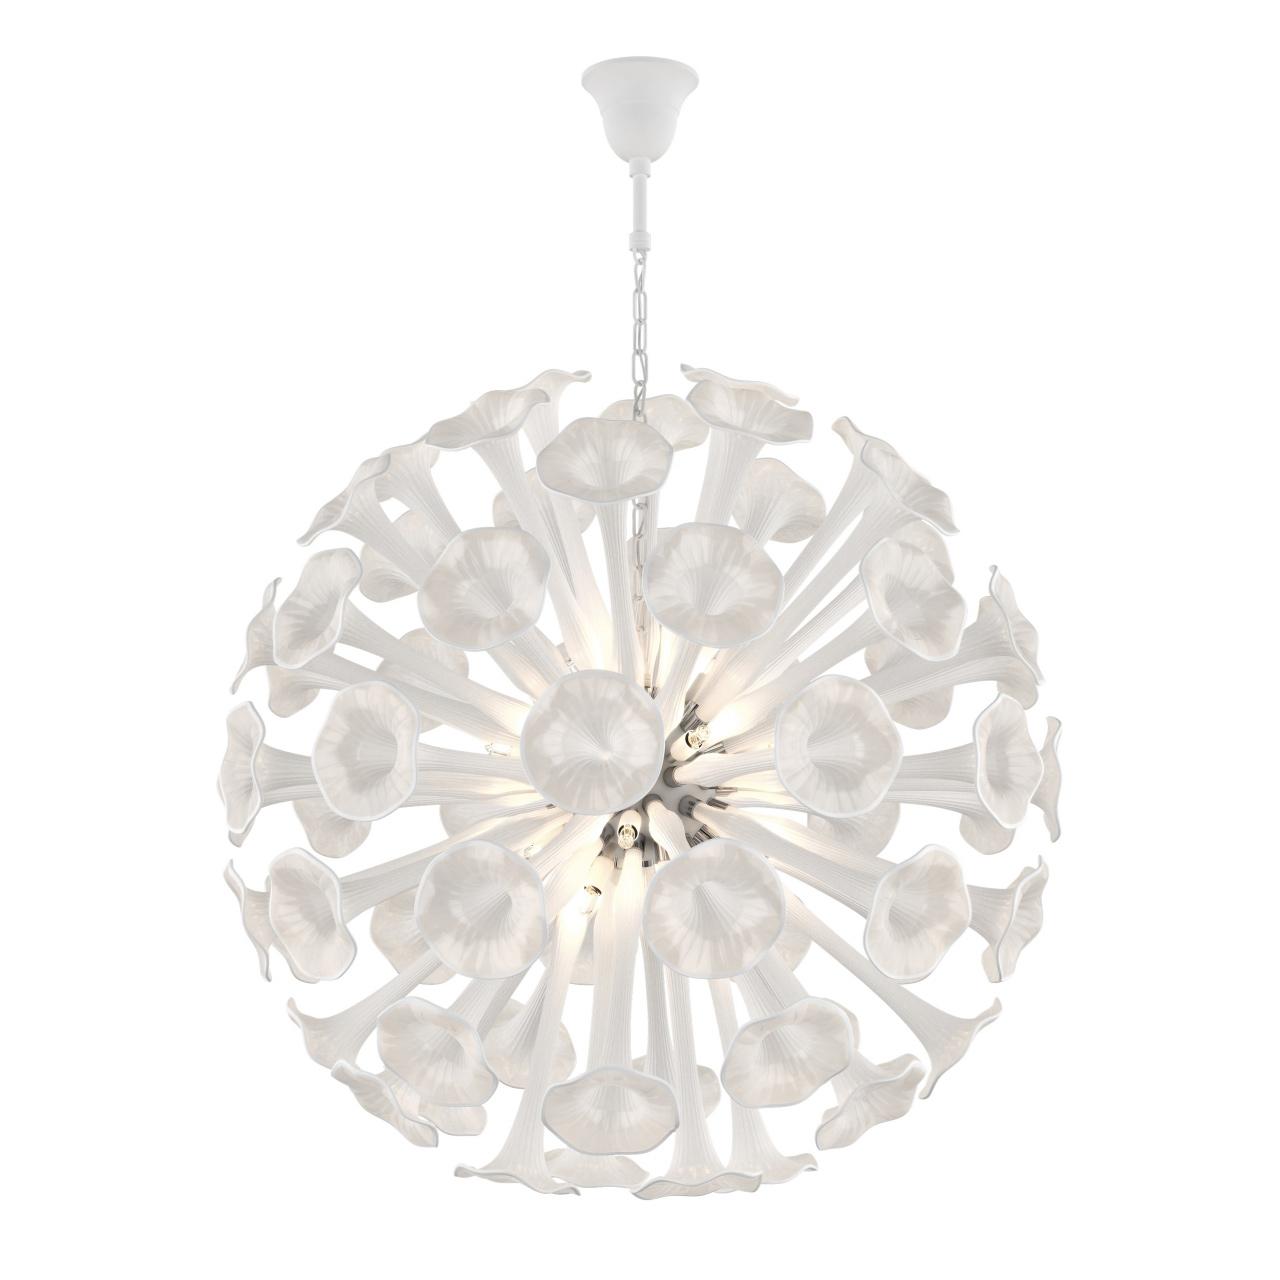 Люстра подвесная Bardano 18х40W G9 белый / белый Lightstar 891186